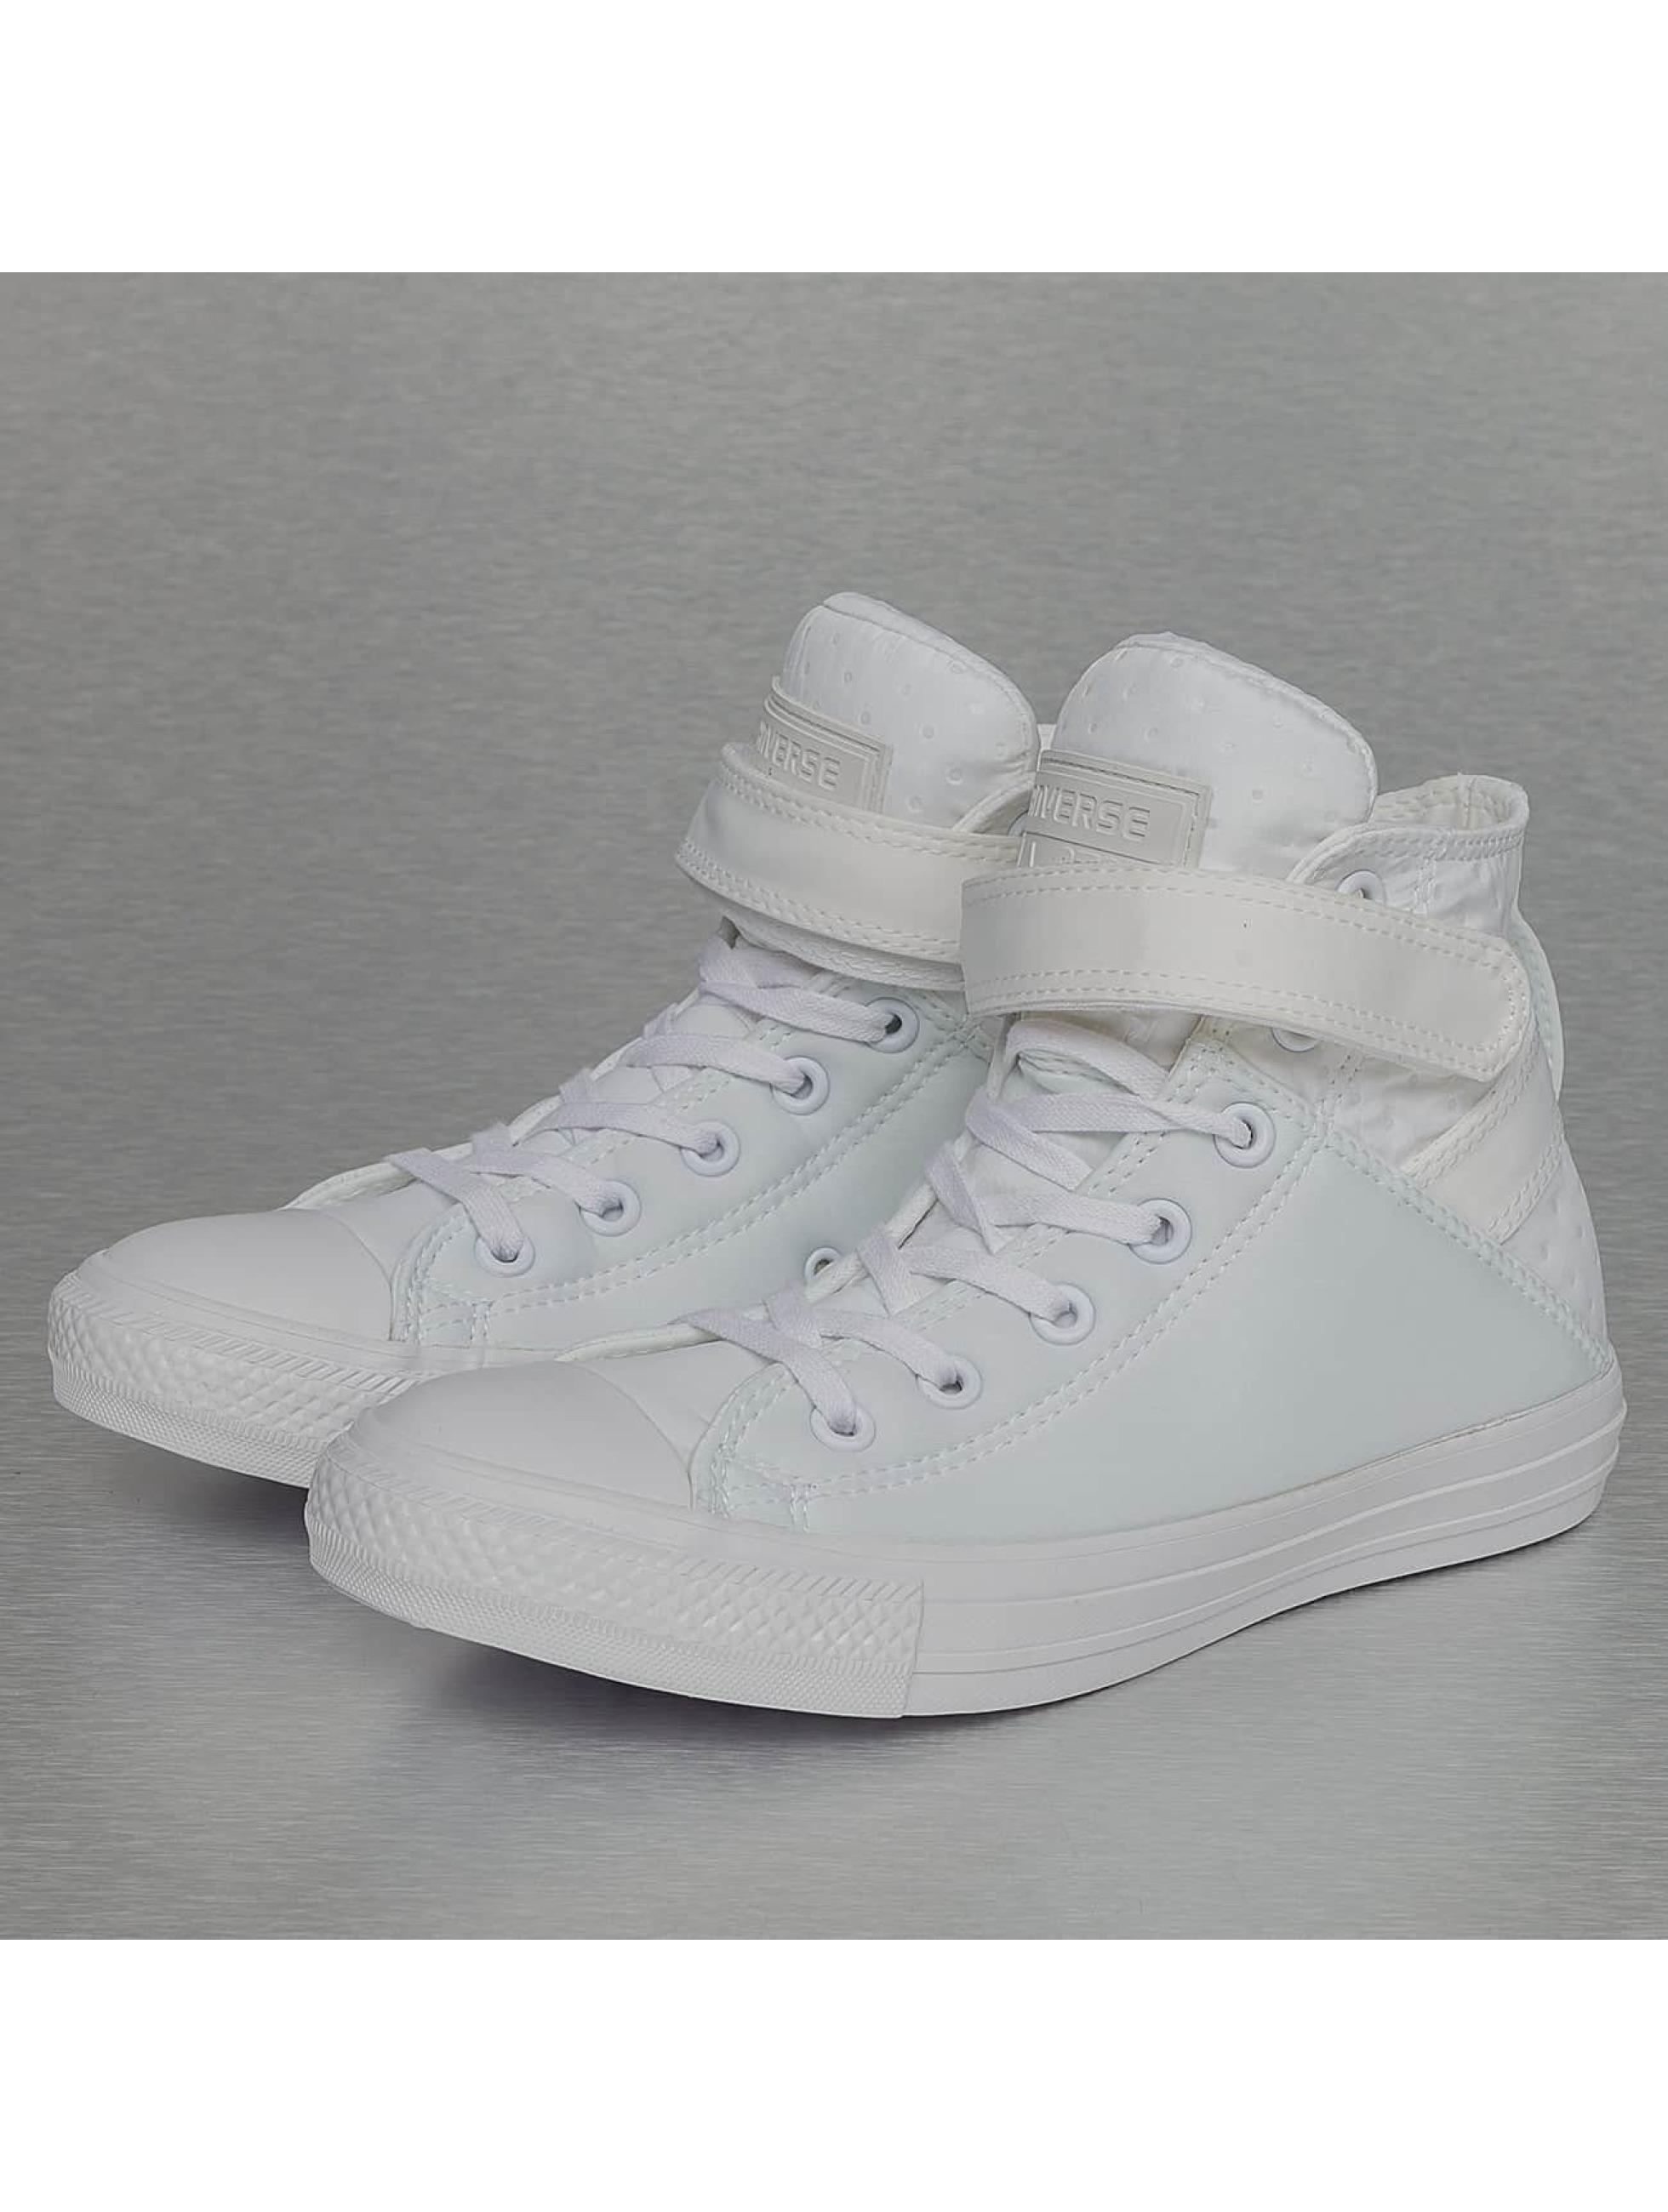 Converse Frauen Sneaker Chuck Taylor All Star Brea in weiß Sale Angebote Laubsdorf